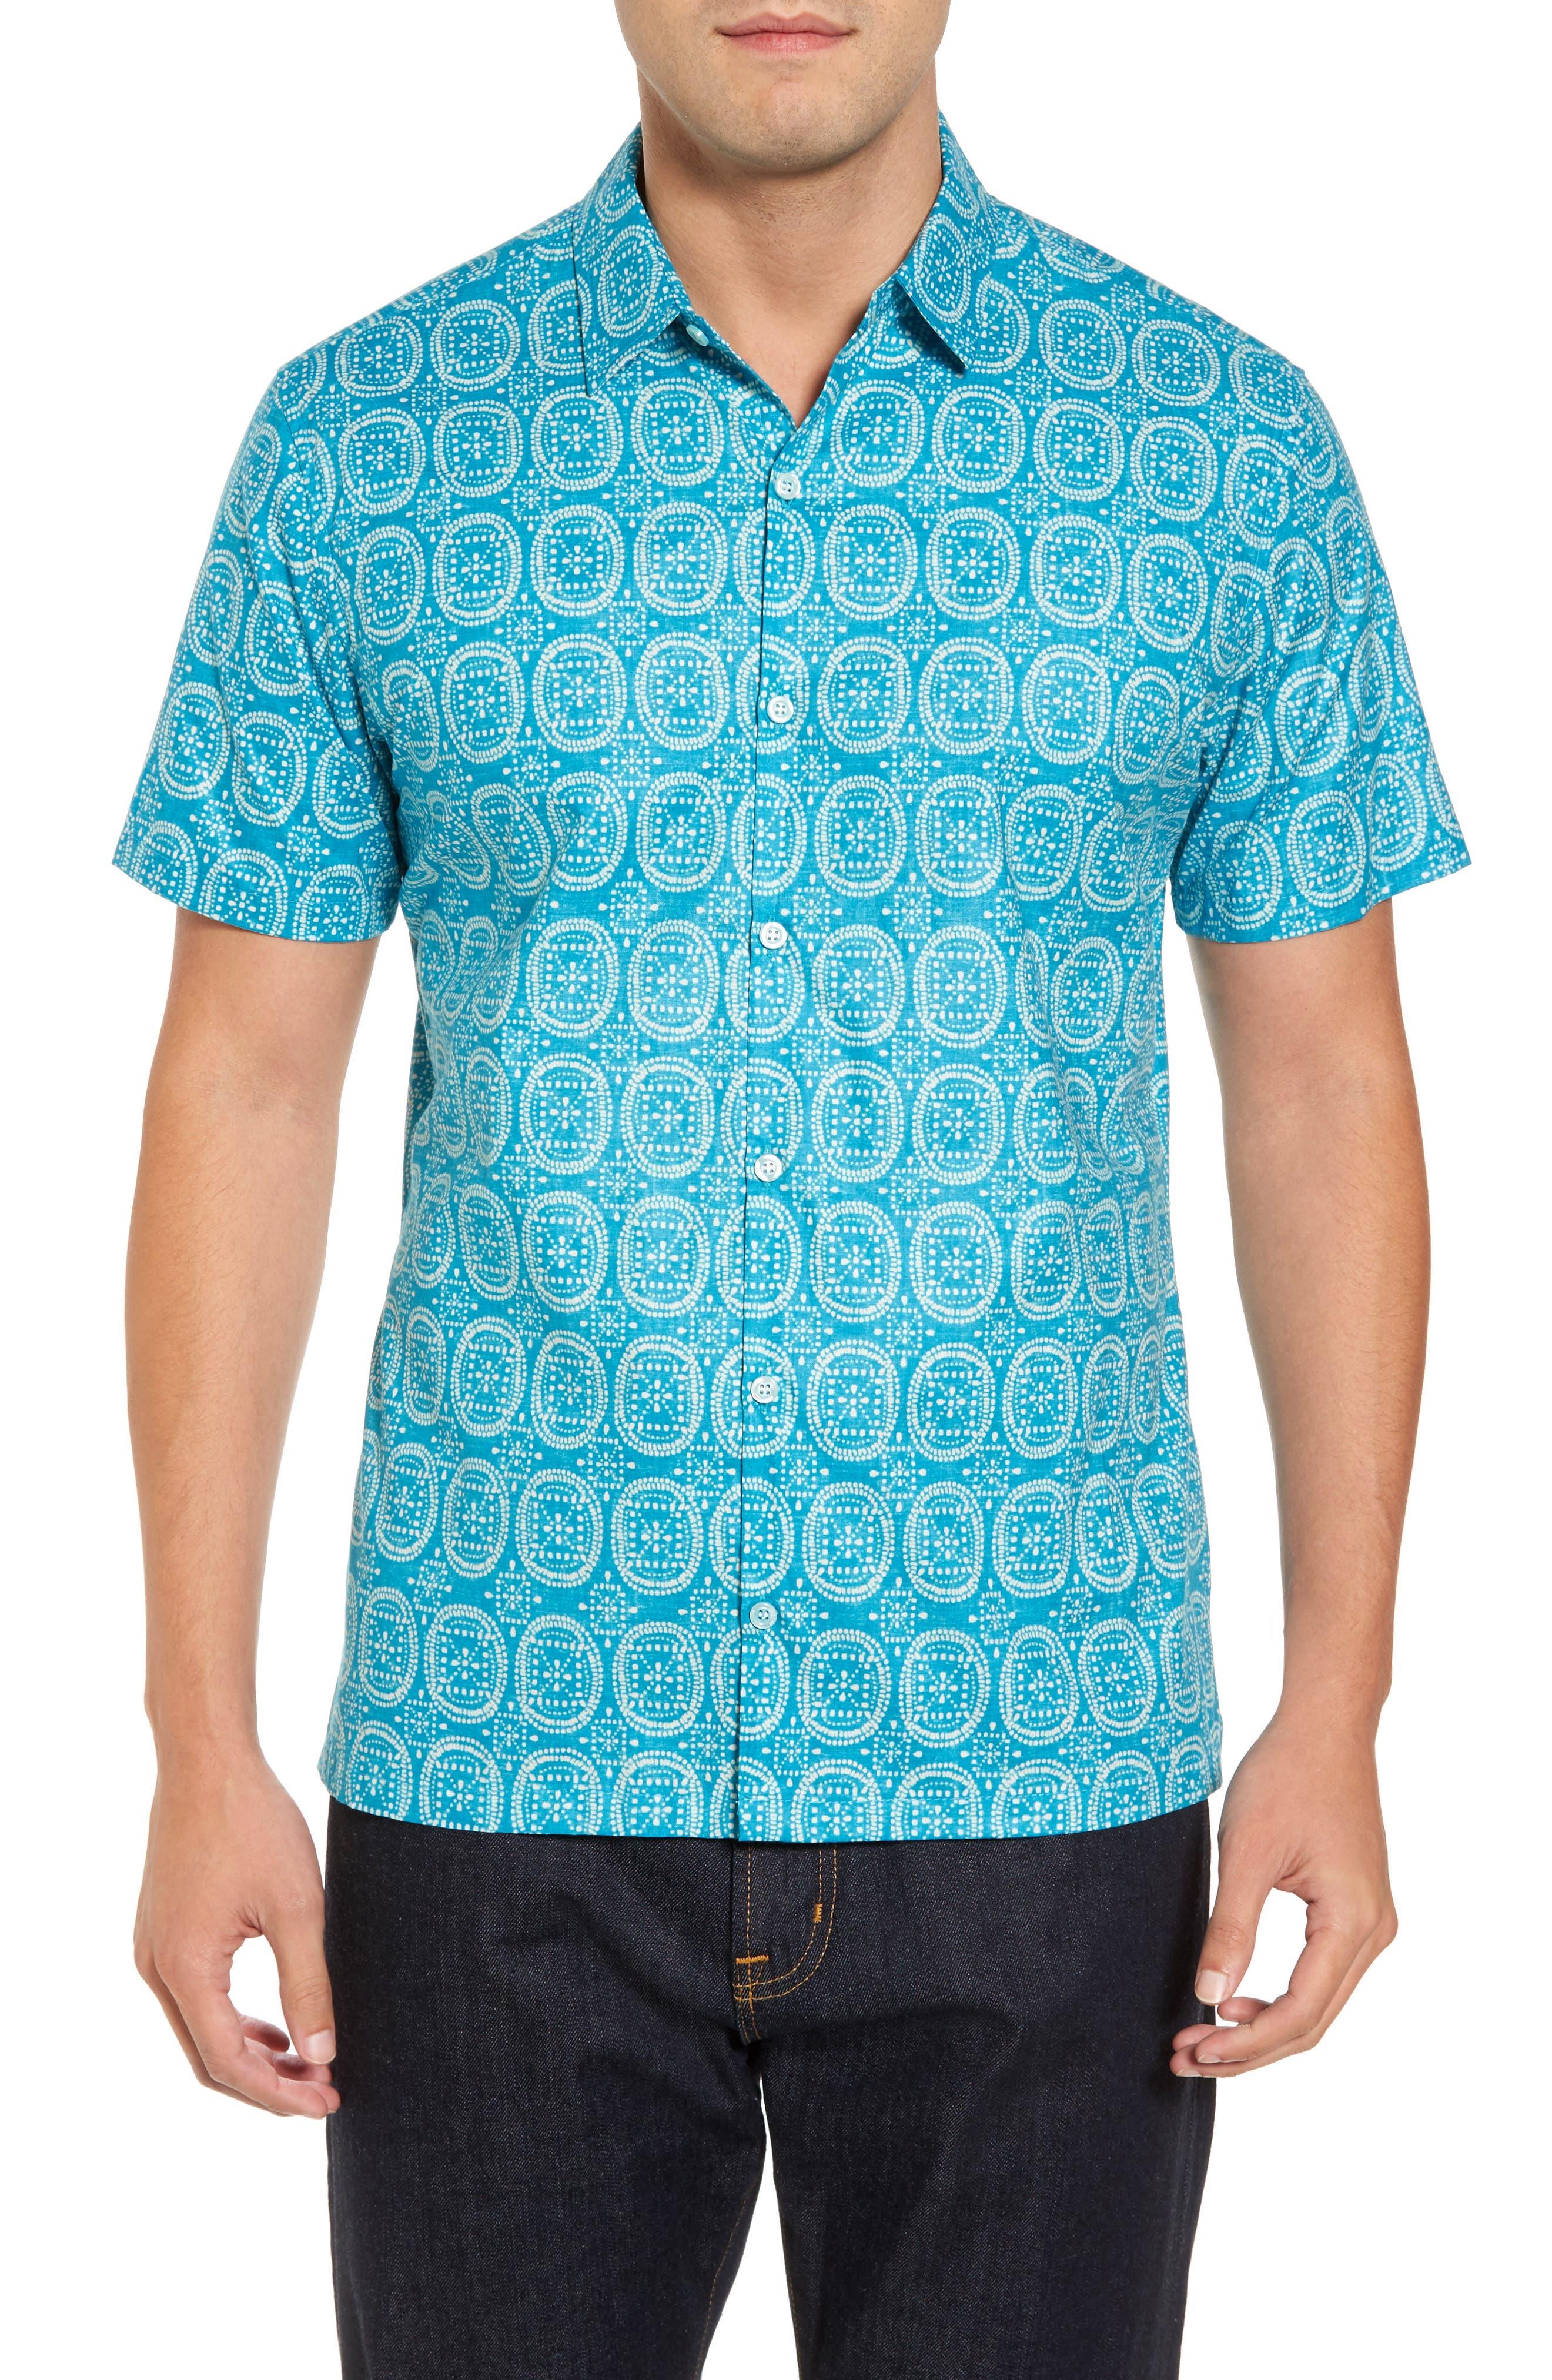 Main Image - Tori Richard Sea Biscuits Trim Fit Print Sport Shirt